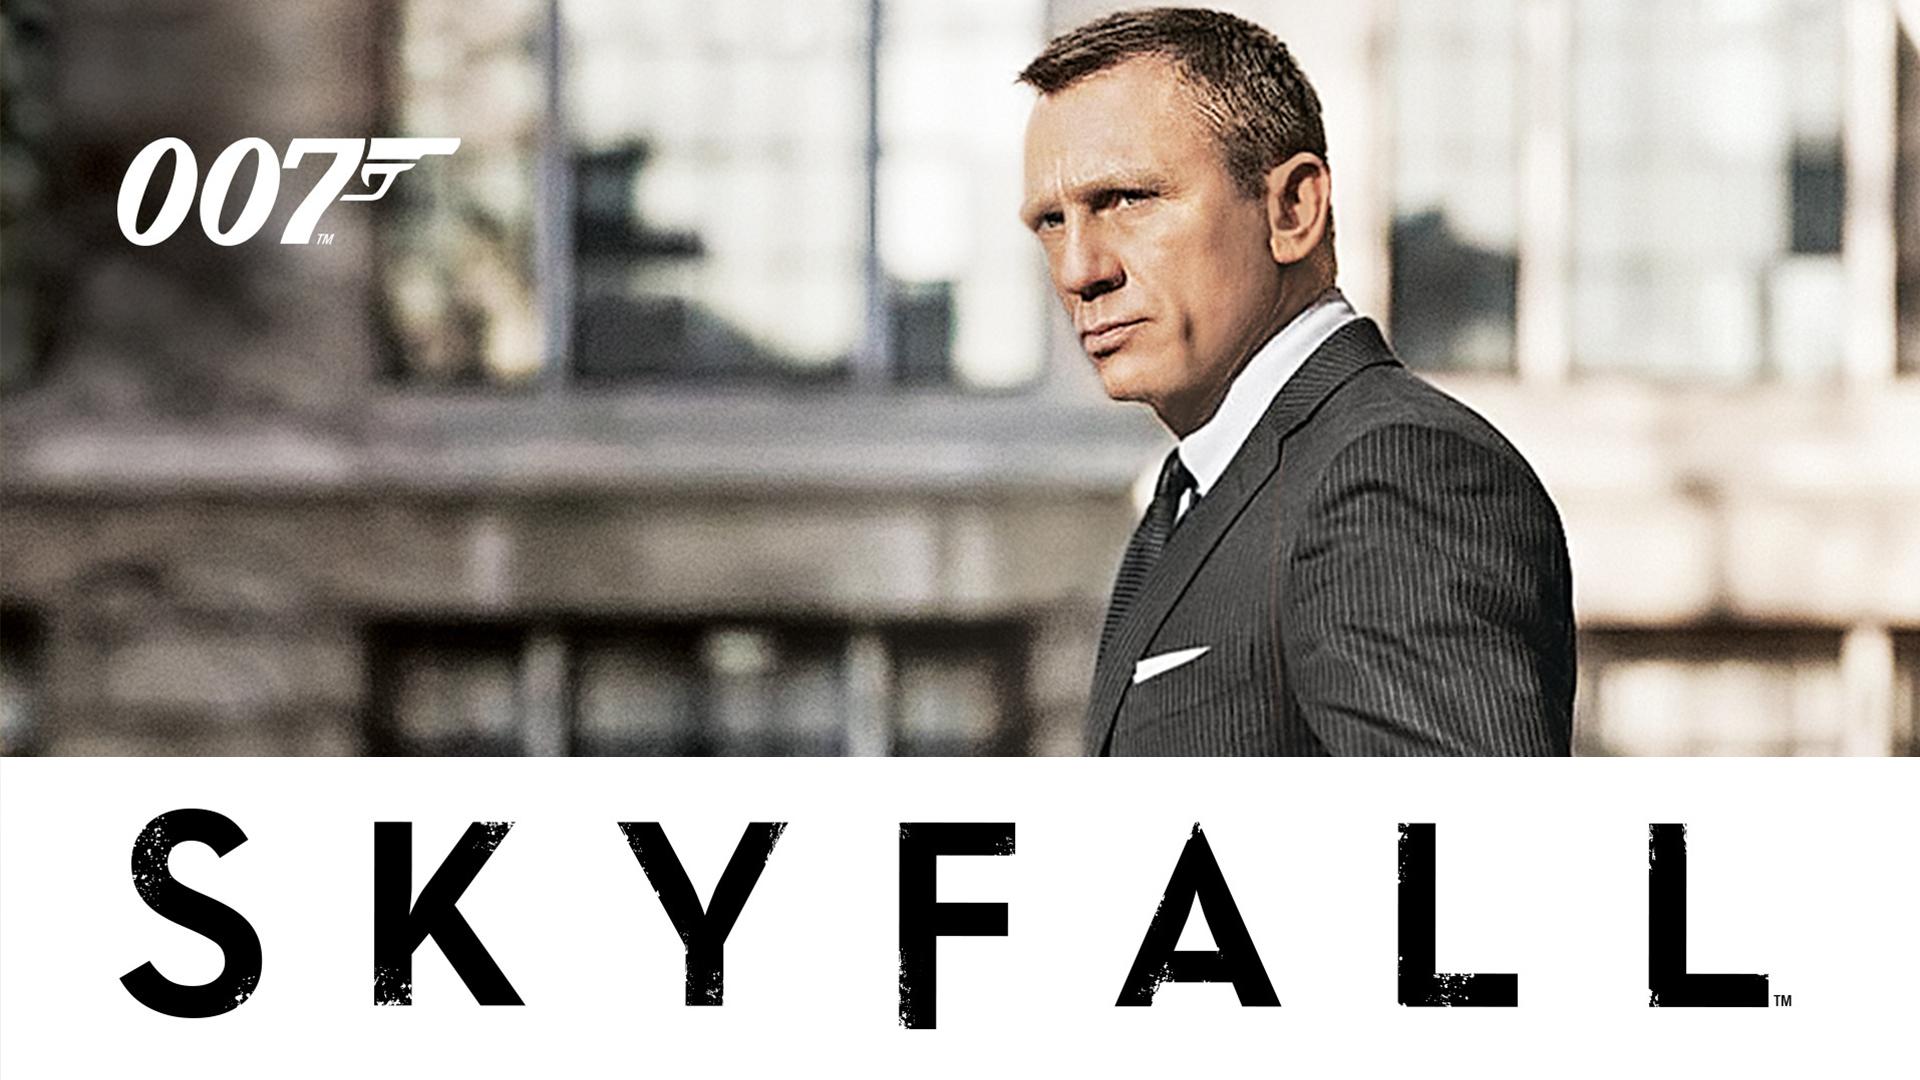 The Daniel Craig Collection $19.99